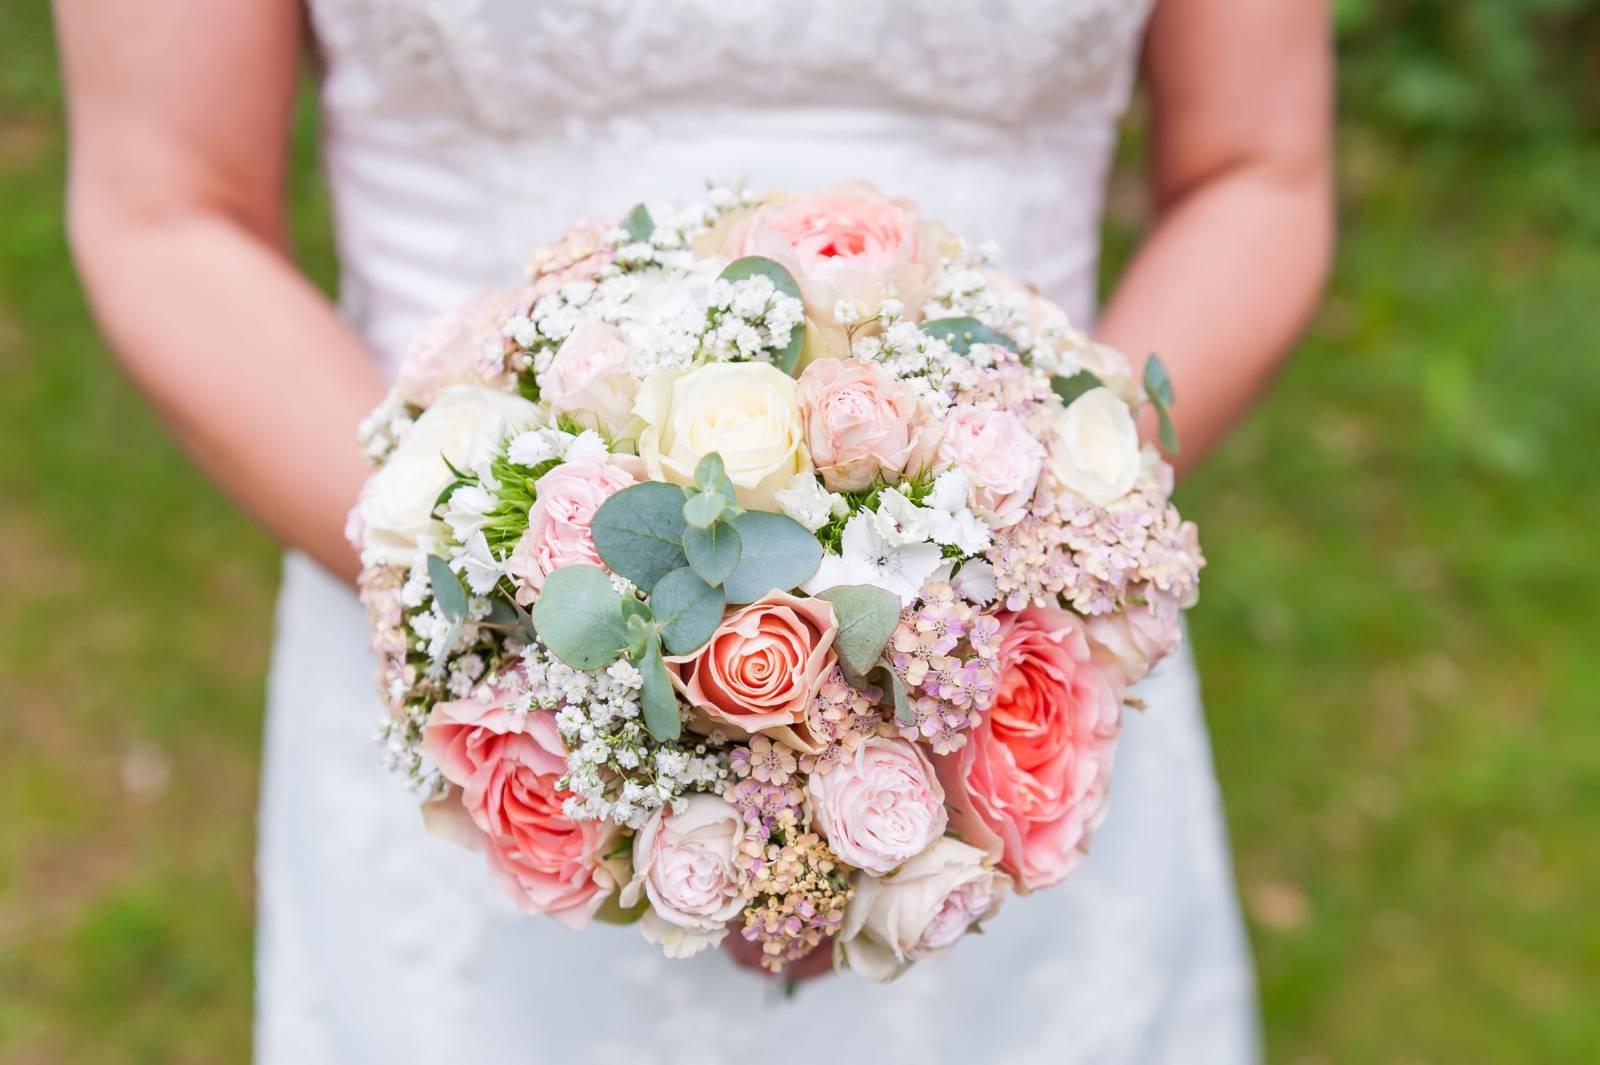 Carpe Diem Bloemen & Decoratie - House of Weddings  - 13